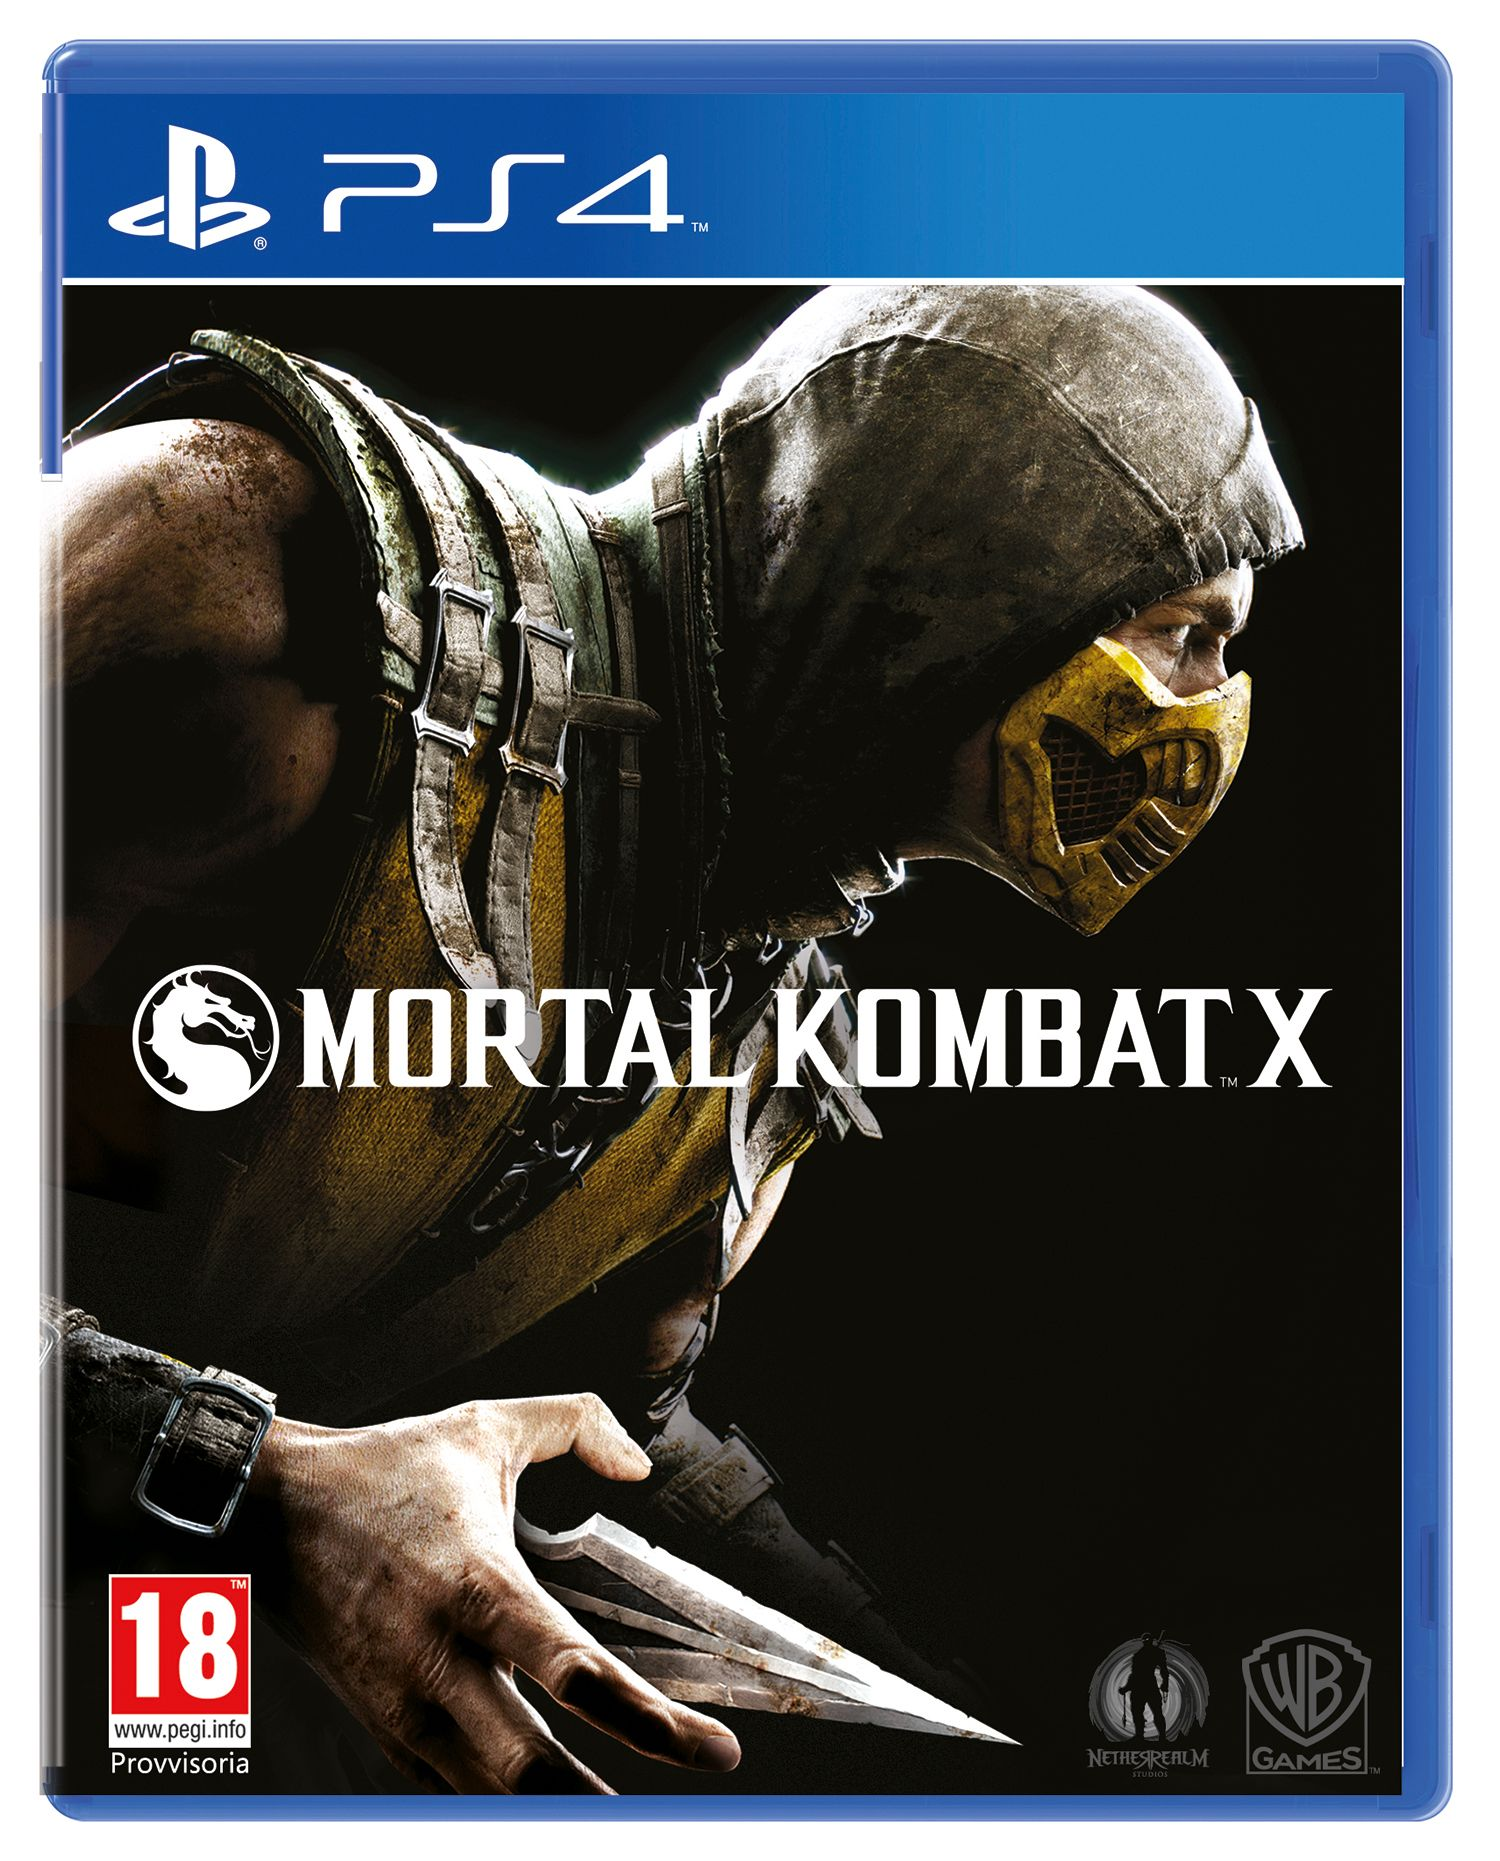 [E3 14] Mortal Kombat X oficialmente anunciado. Trailer disponible 6avz